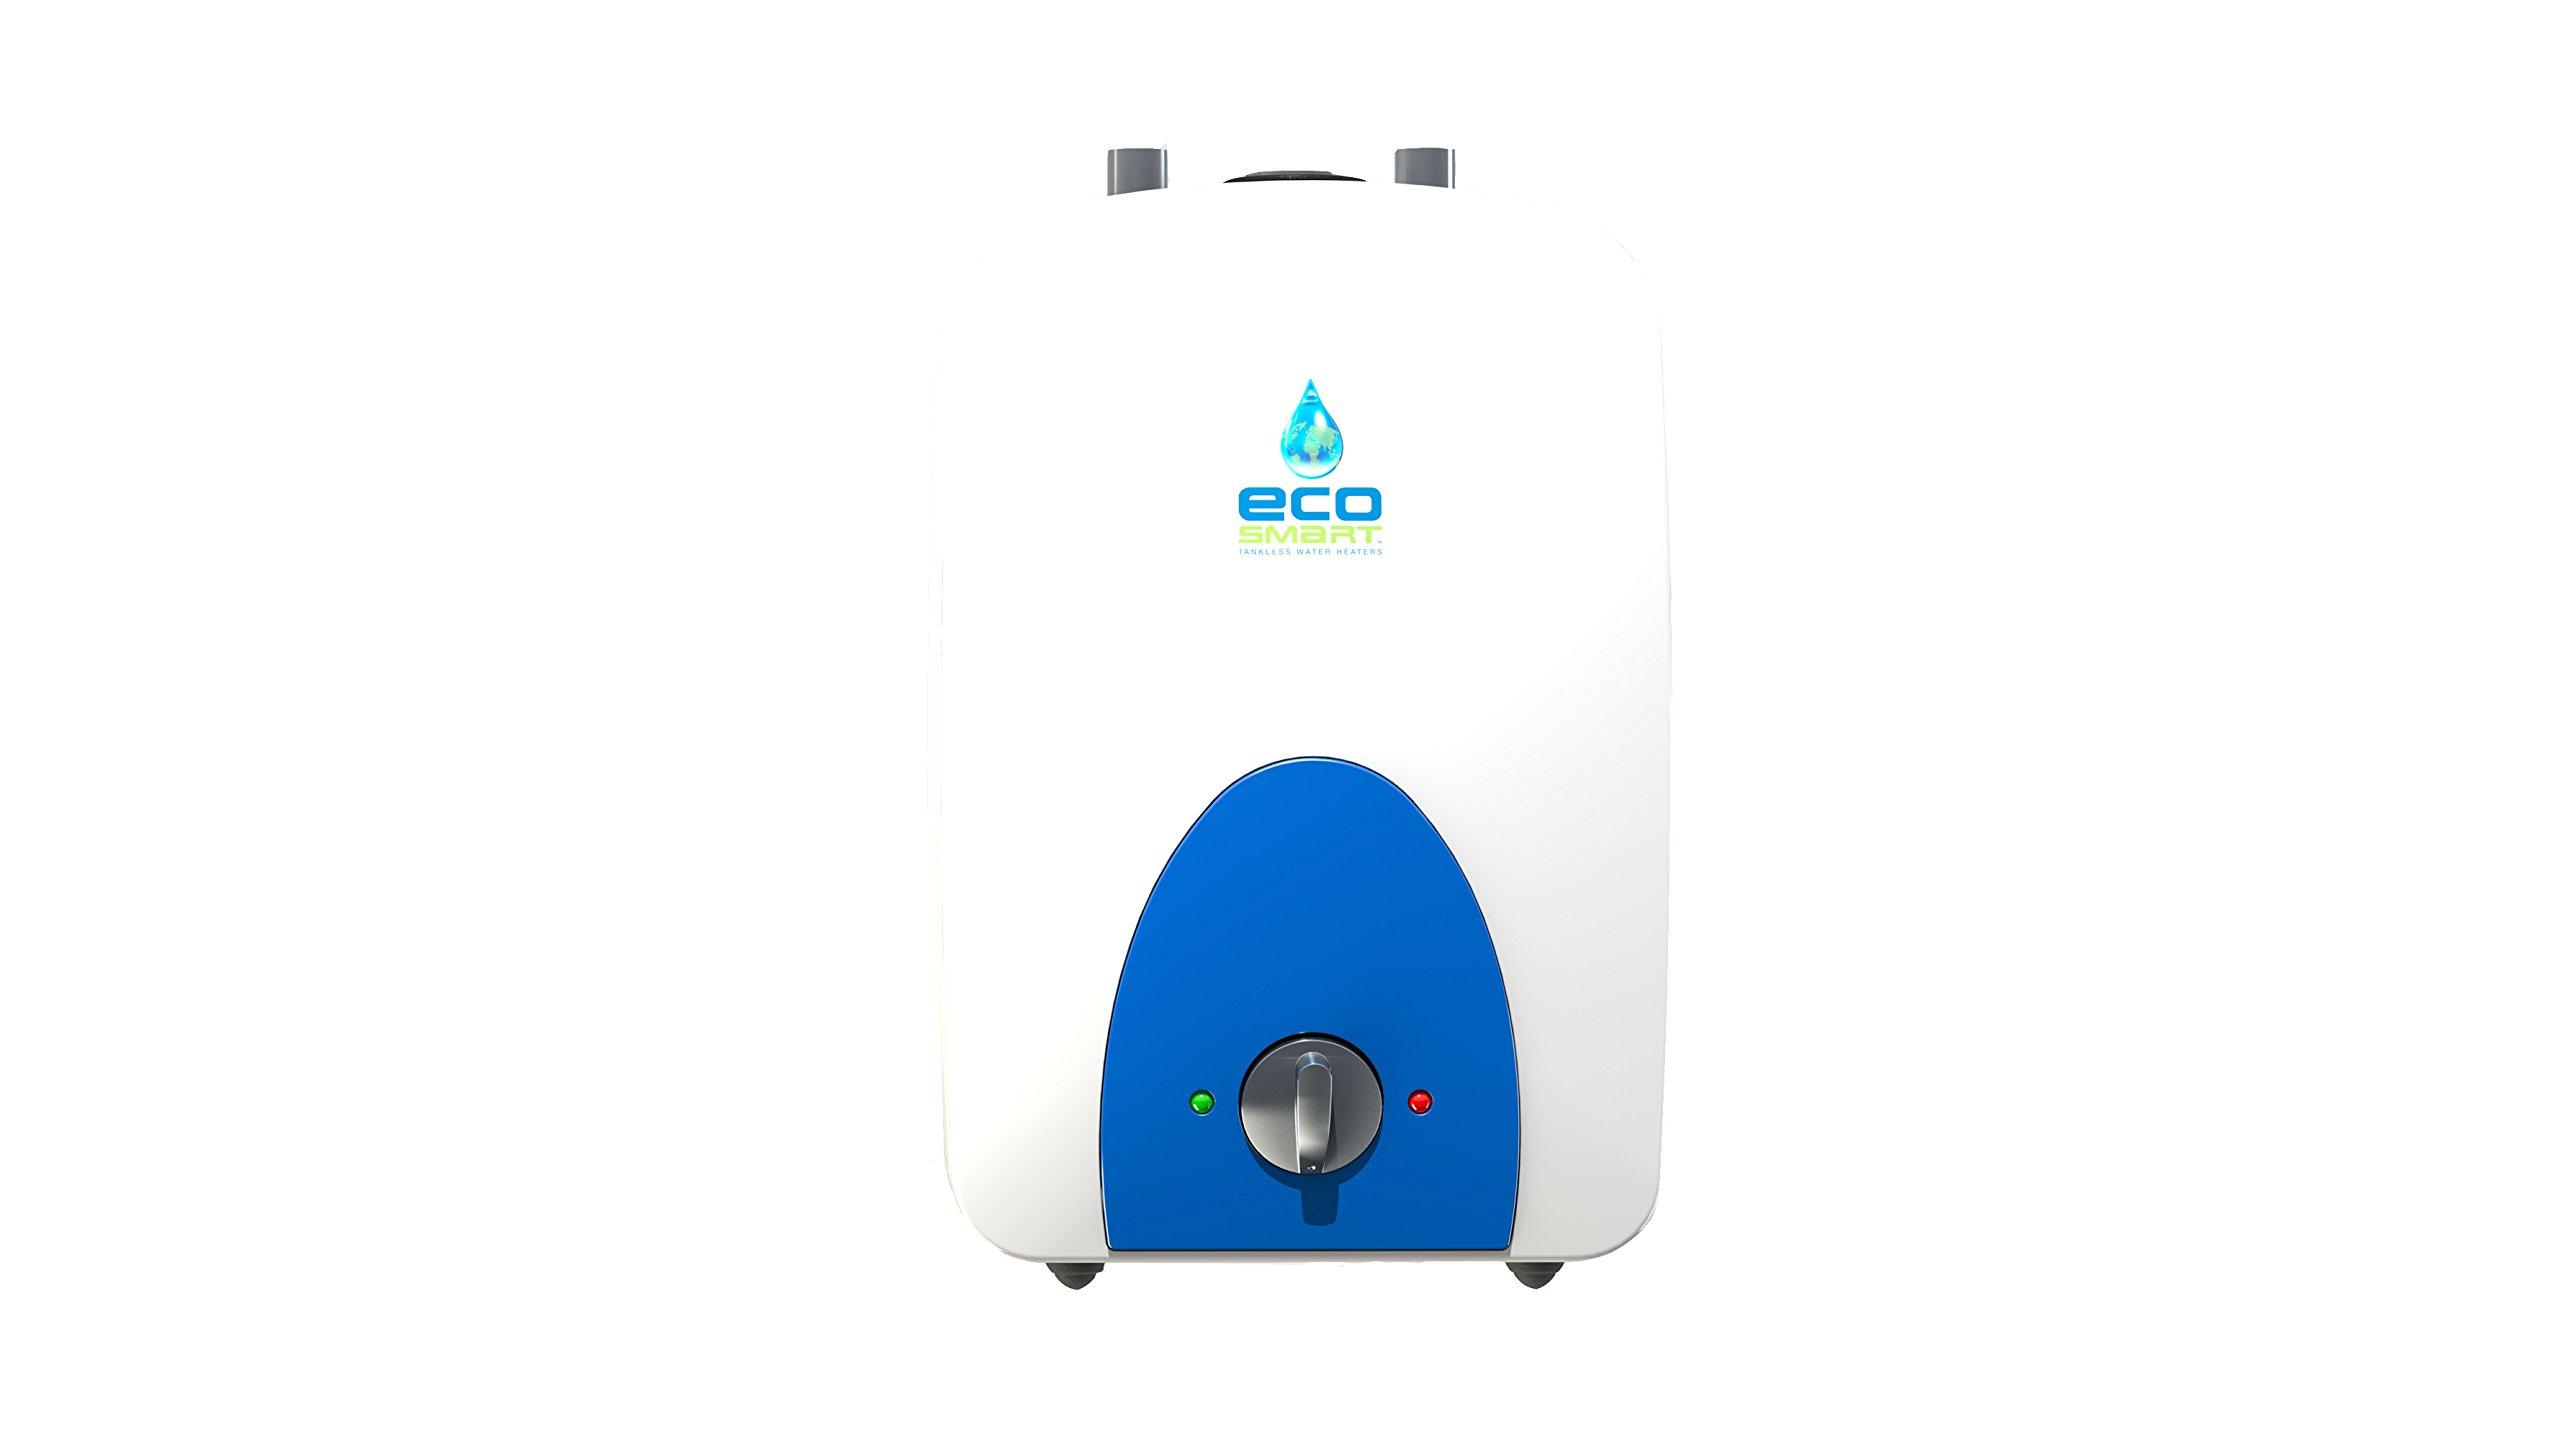 Ecosmart ECO MINI 4 4-Gallon 120V Electric Mini Tank Water Heater